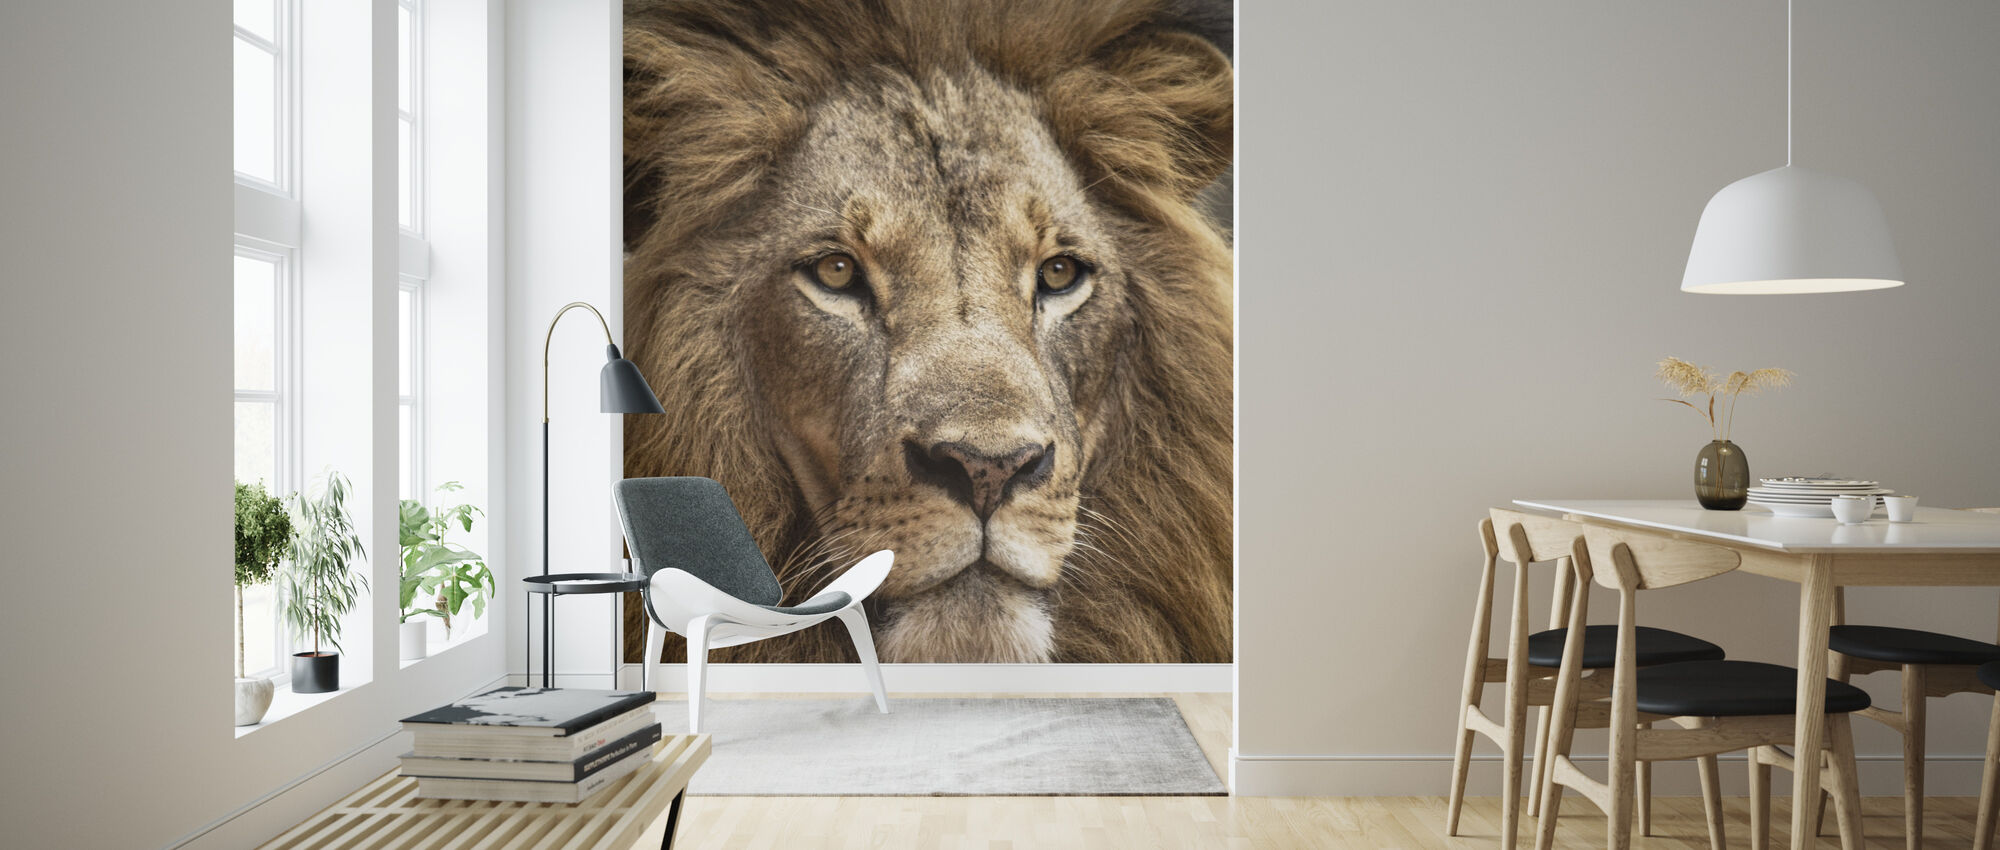 Stunning Lion - Wallpaper - Living Room